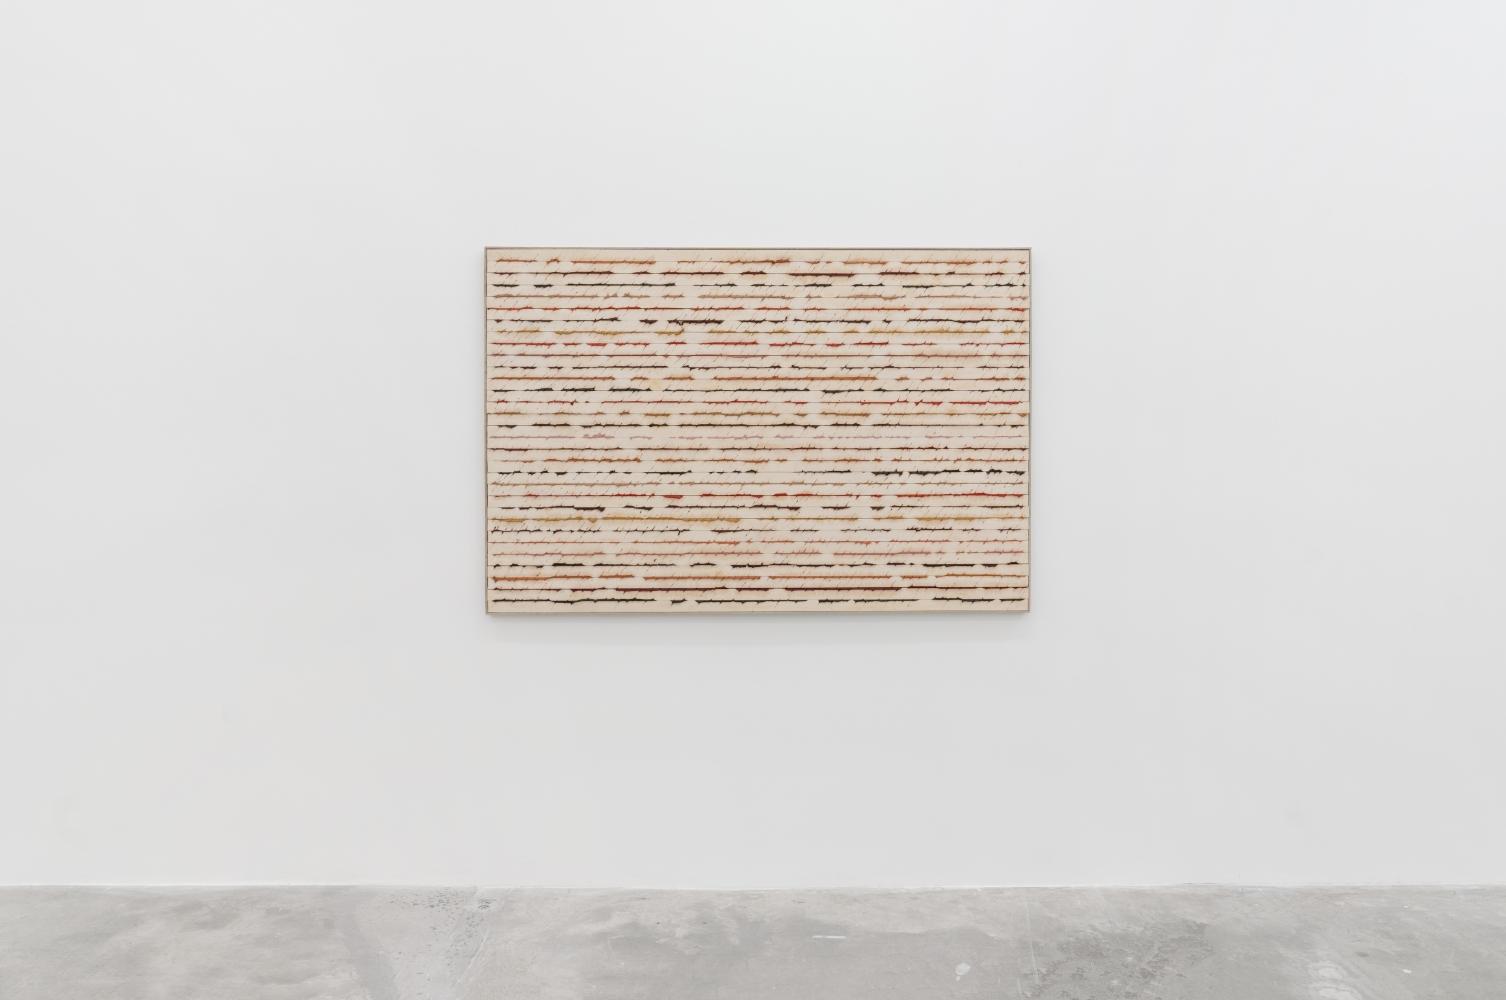 Ha Chong-Hyun (b. 1935)  Post Conjunction 11-4, 2011  Mixed Media  47.24 x 70.87 inches  120 x 180 cm